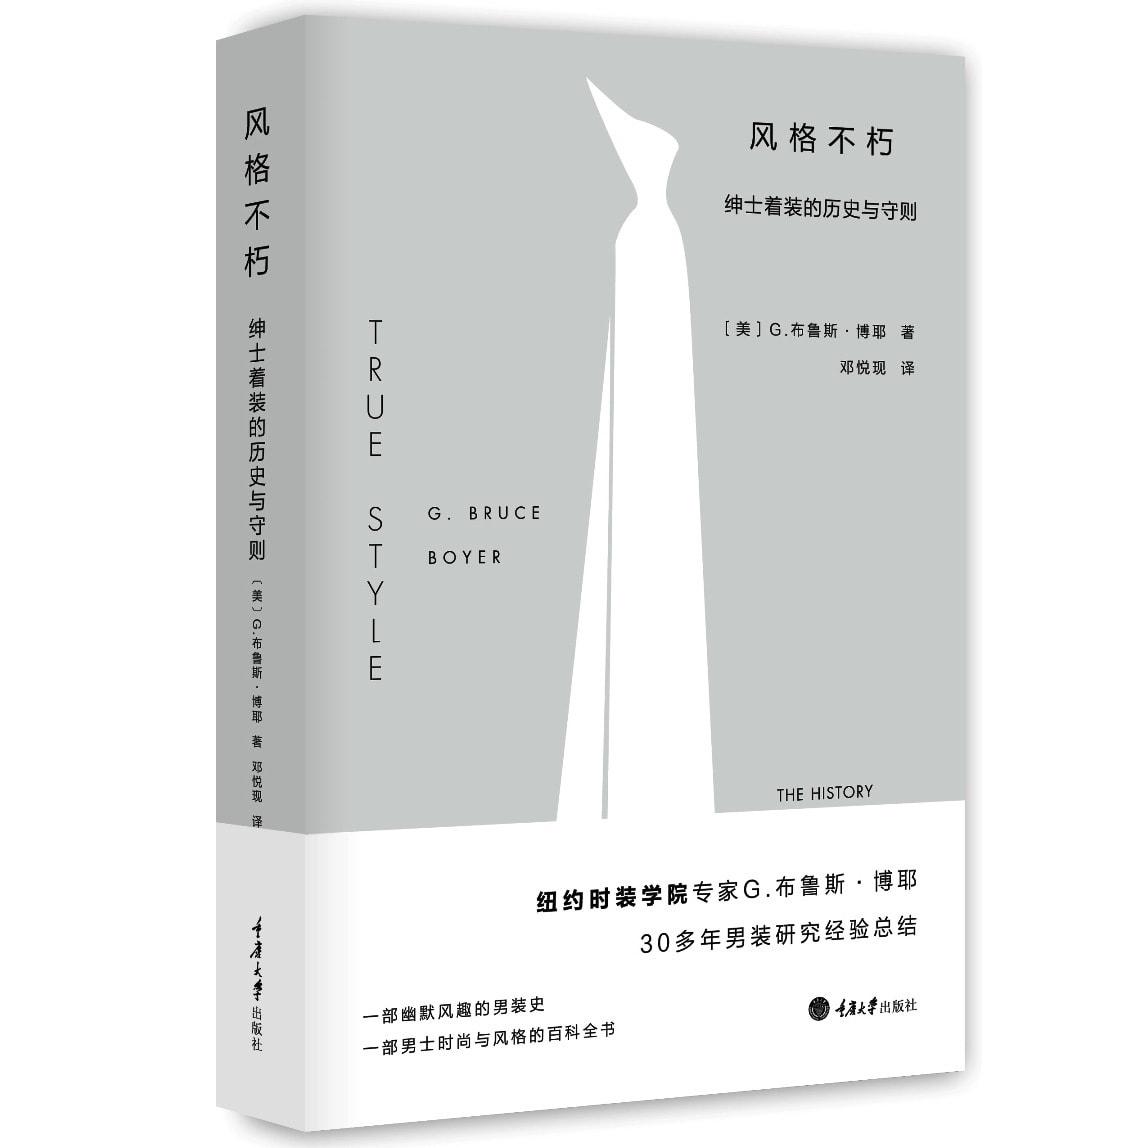 Yamibuy.com:Customer reviews:风格不朽:绅士着装的历史与守则